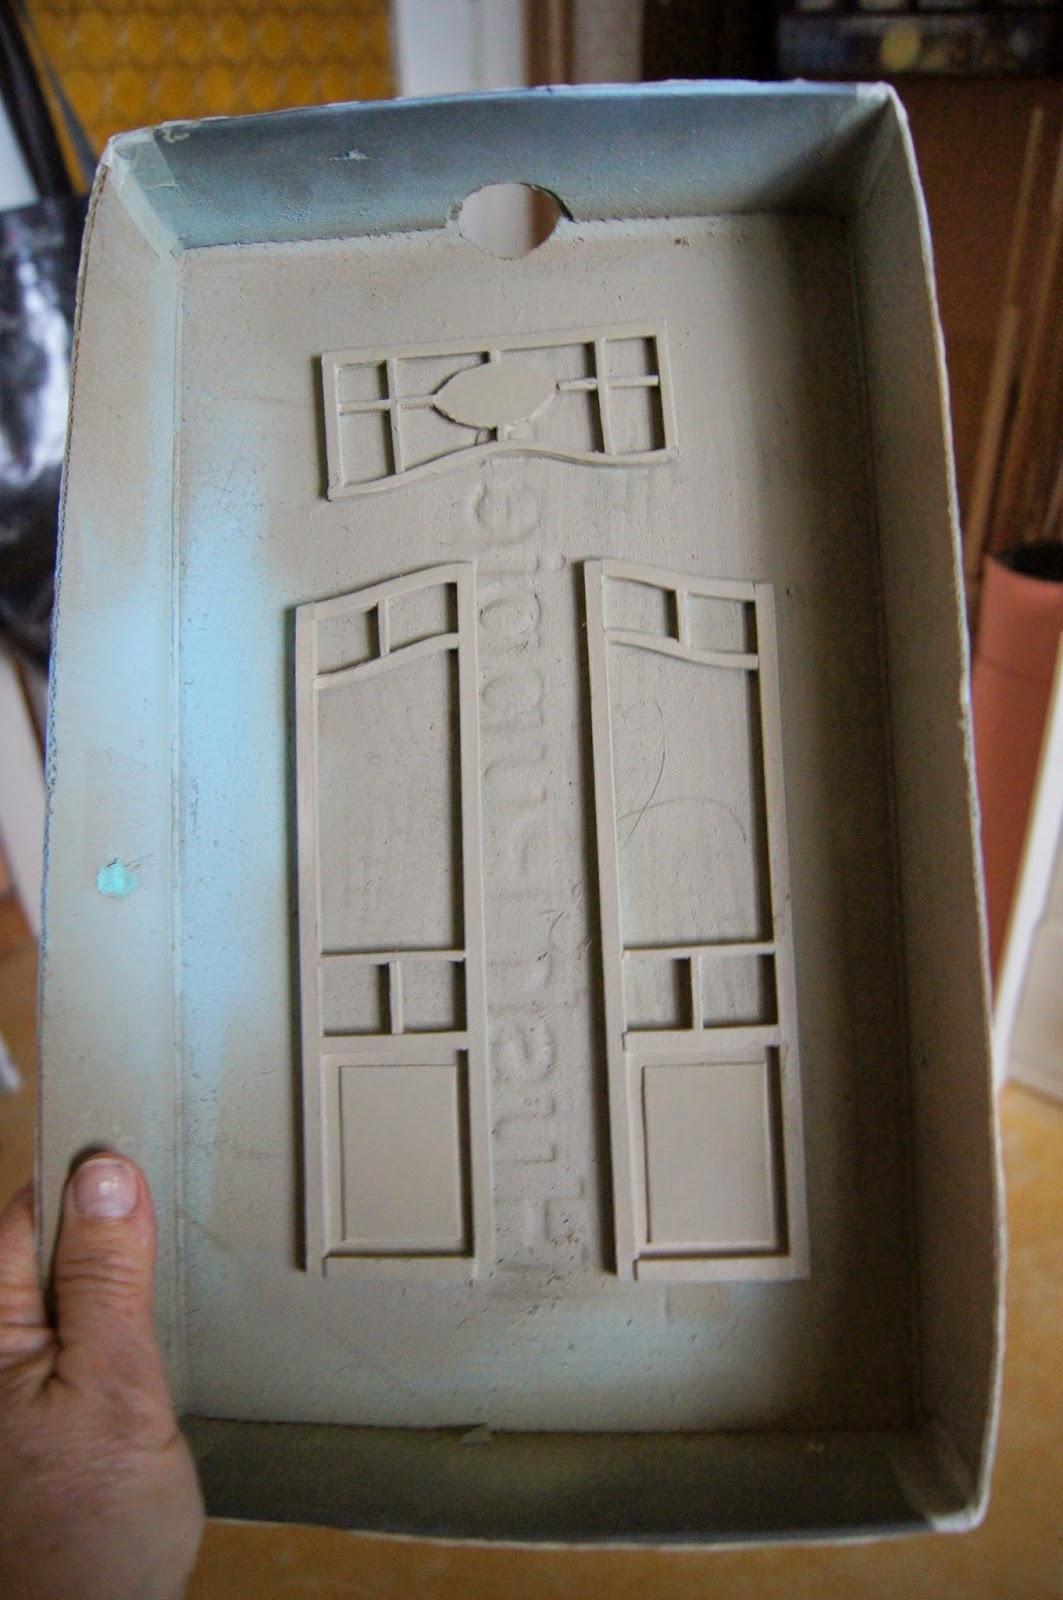 nono mini nostalgie une porte et une boite pain pour timeless nostalgia. Black Bedroom Furniture Sets. Home Design Ideas